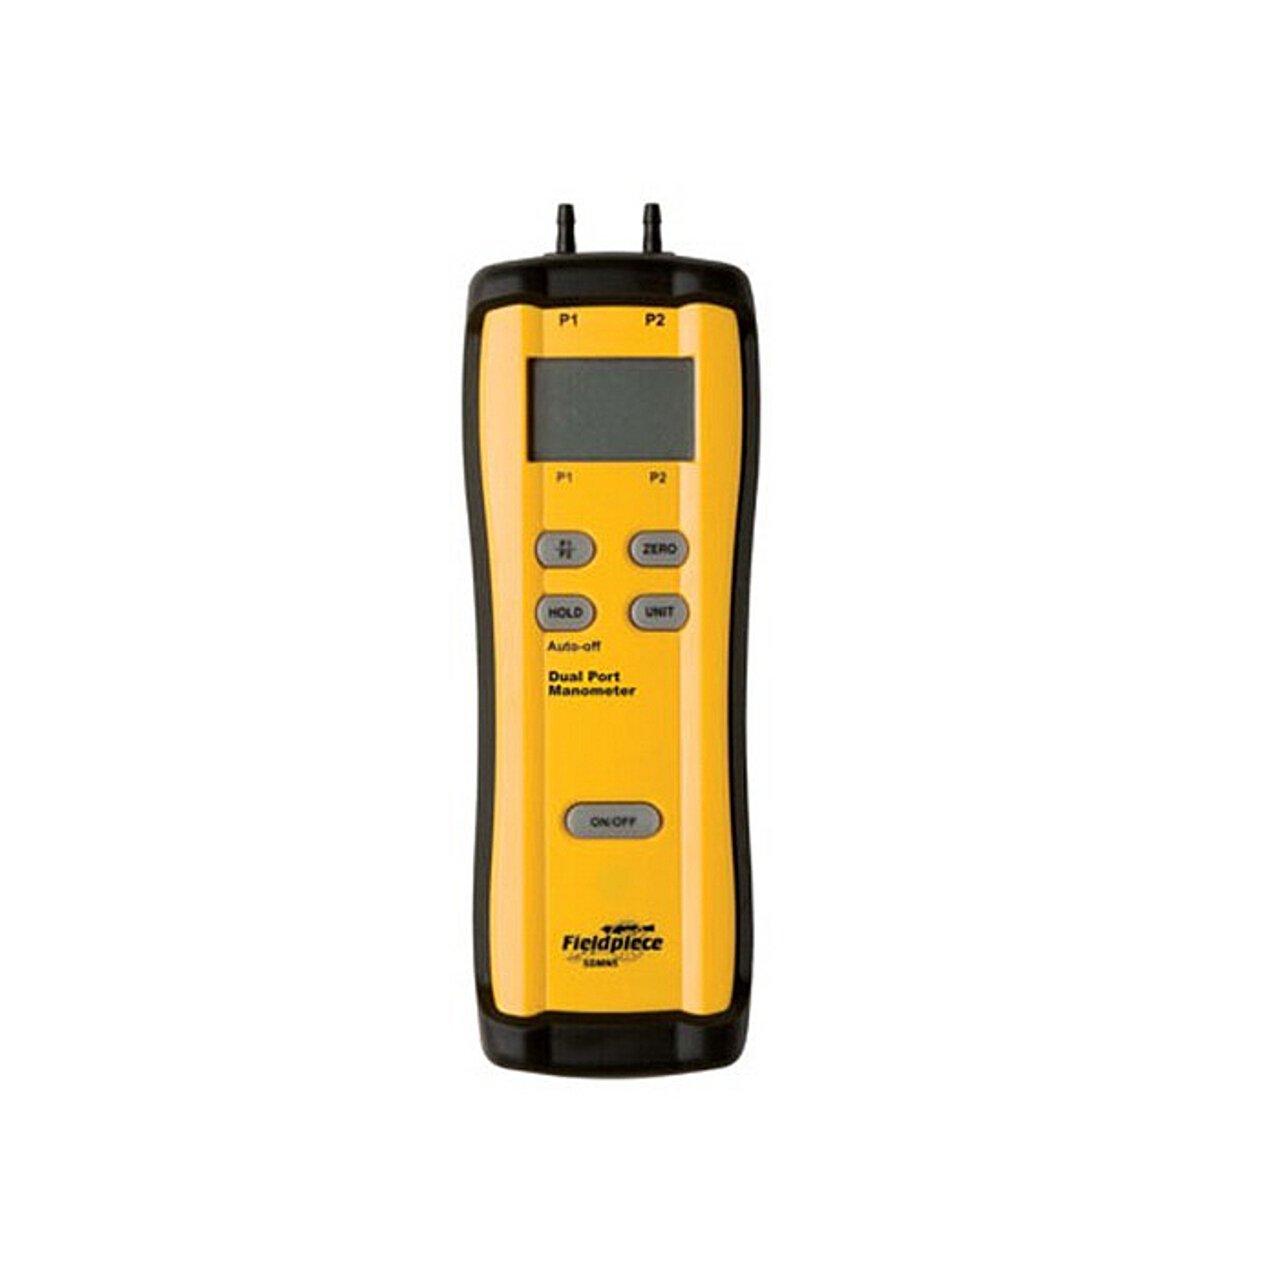 Fieldpiece Dual-Port Manometer - SDMN5